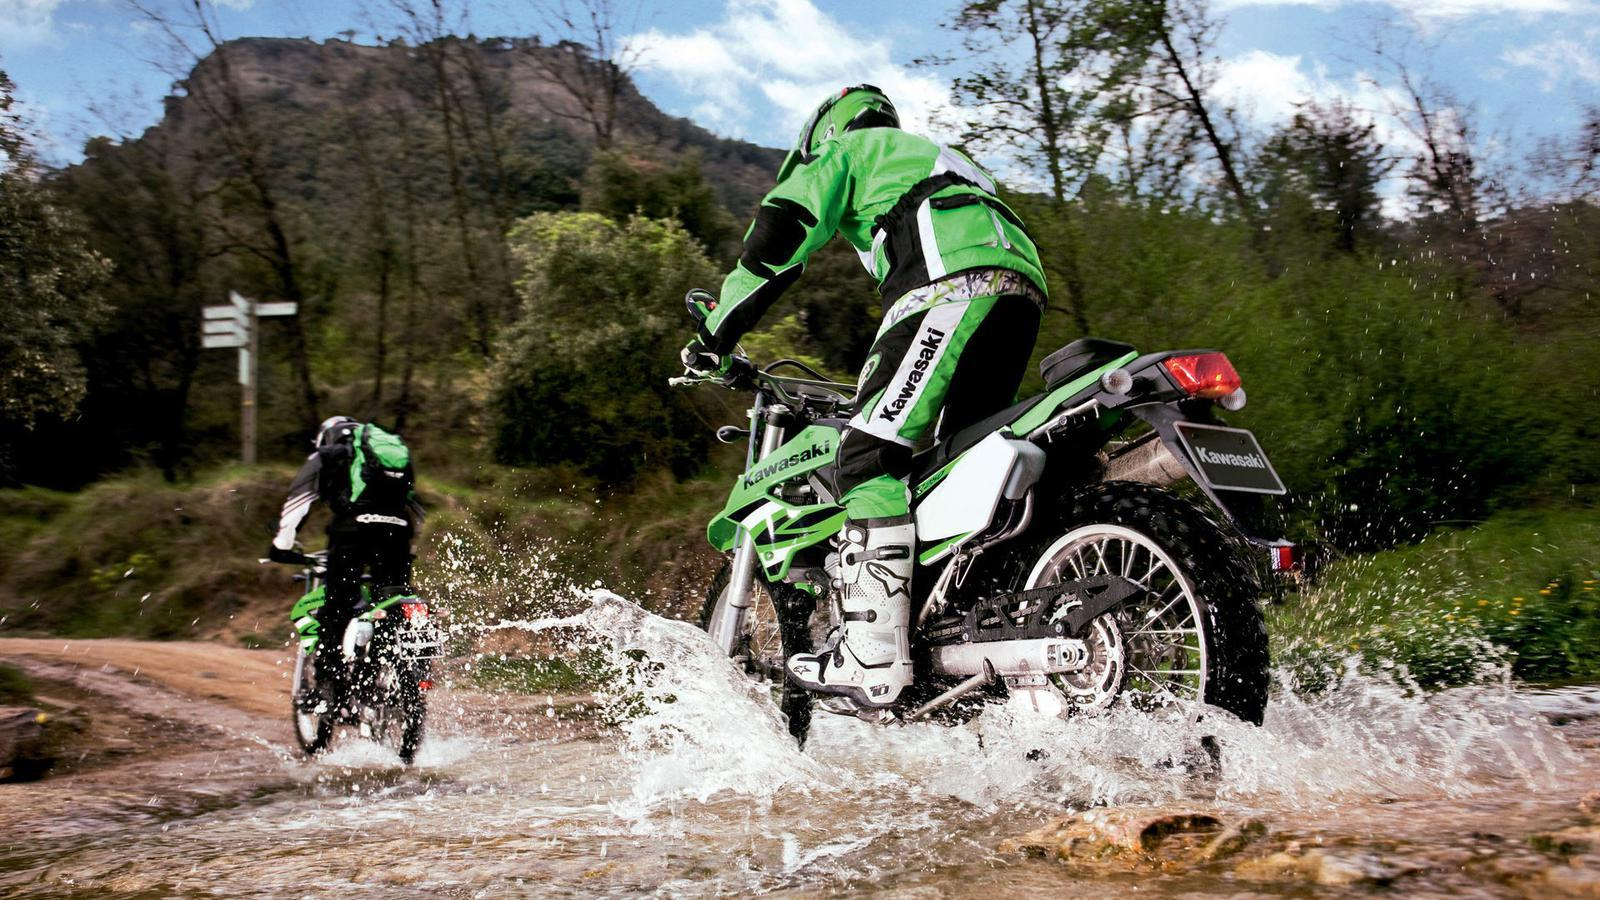 Kawasaki Motorcycles - Las Vegas, NV Carter Powersports Las